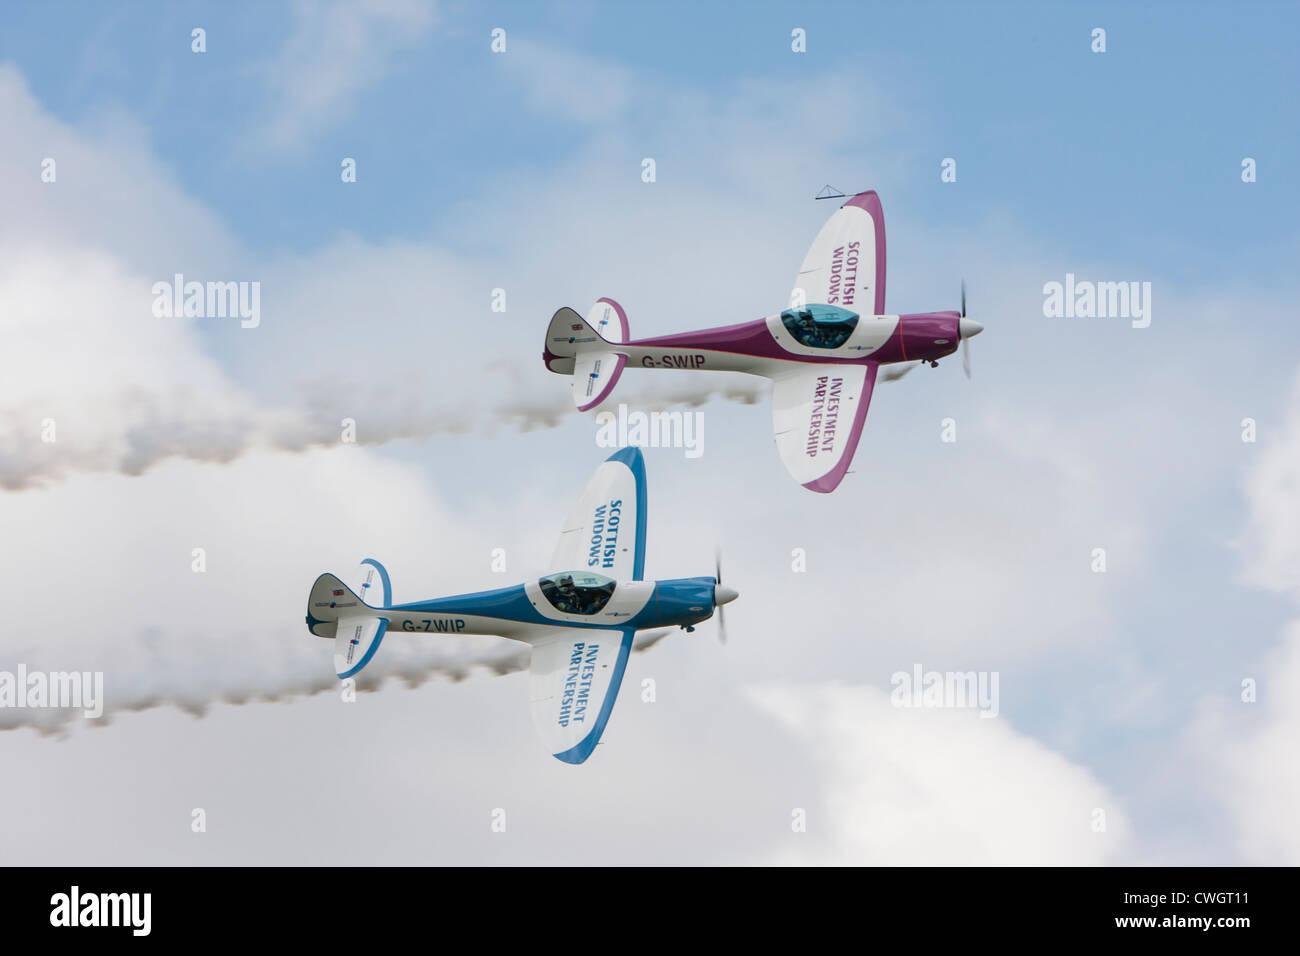 Silence Twisters, reg G-SWIP and G-ZWIP, aerobatic team sponsored by Scottish Widows - Stock Image